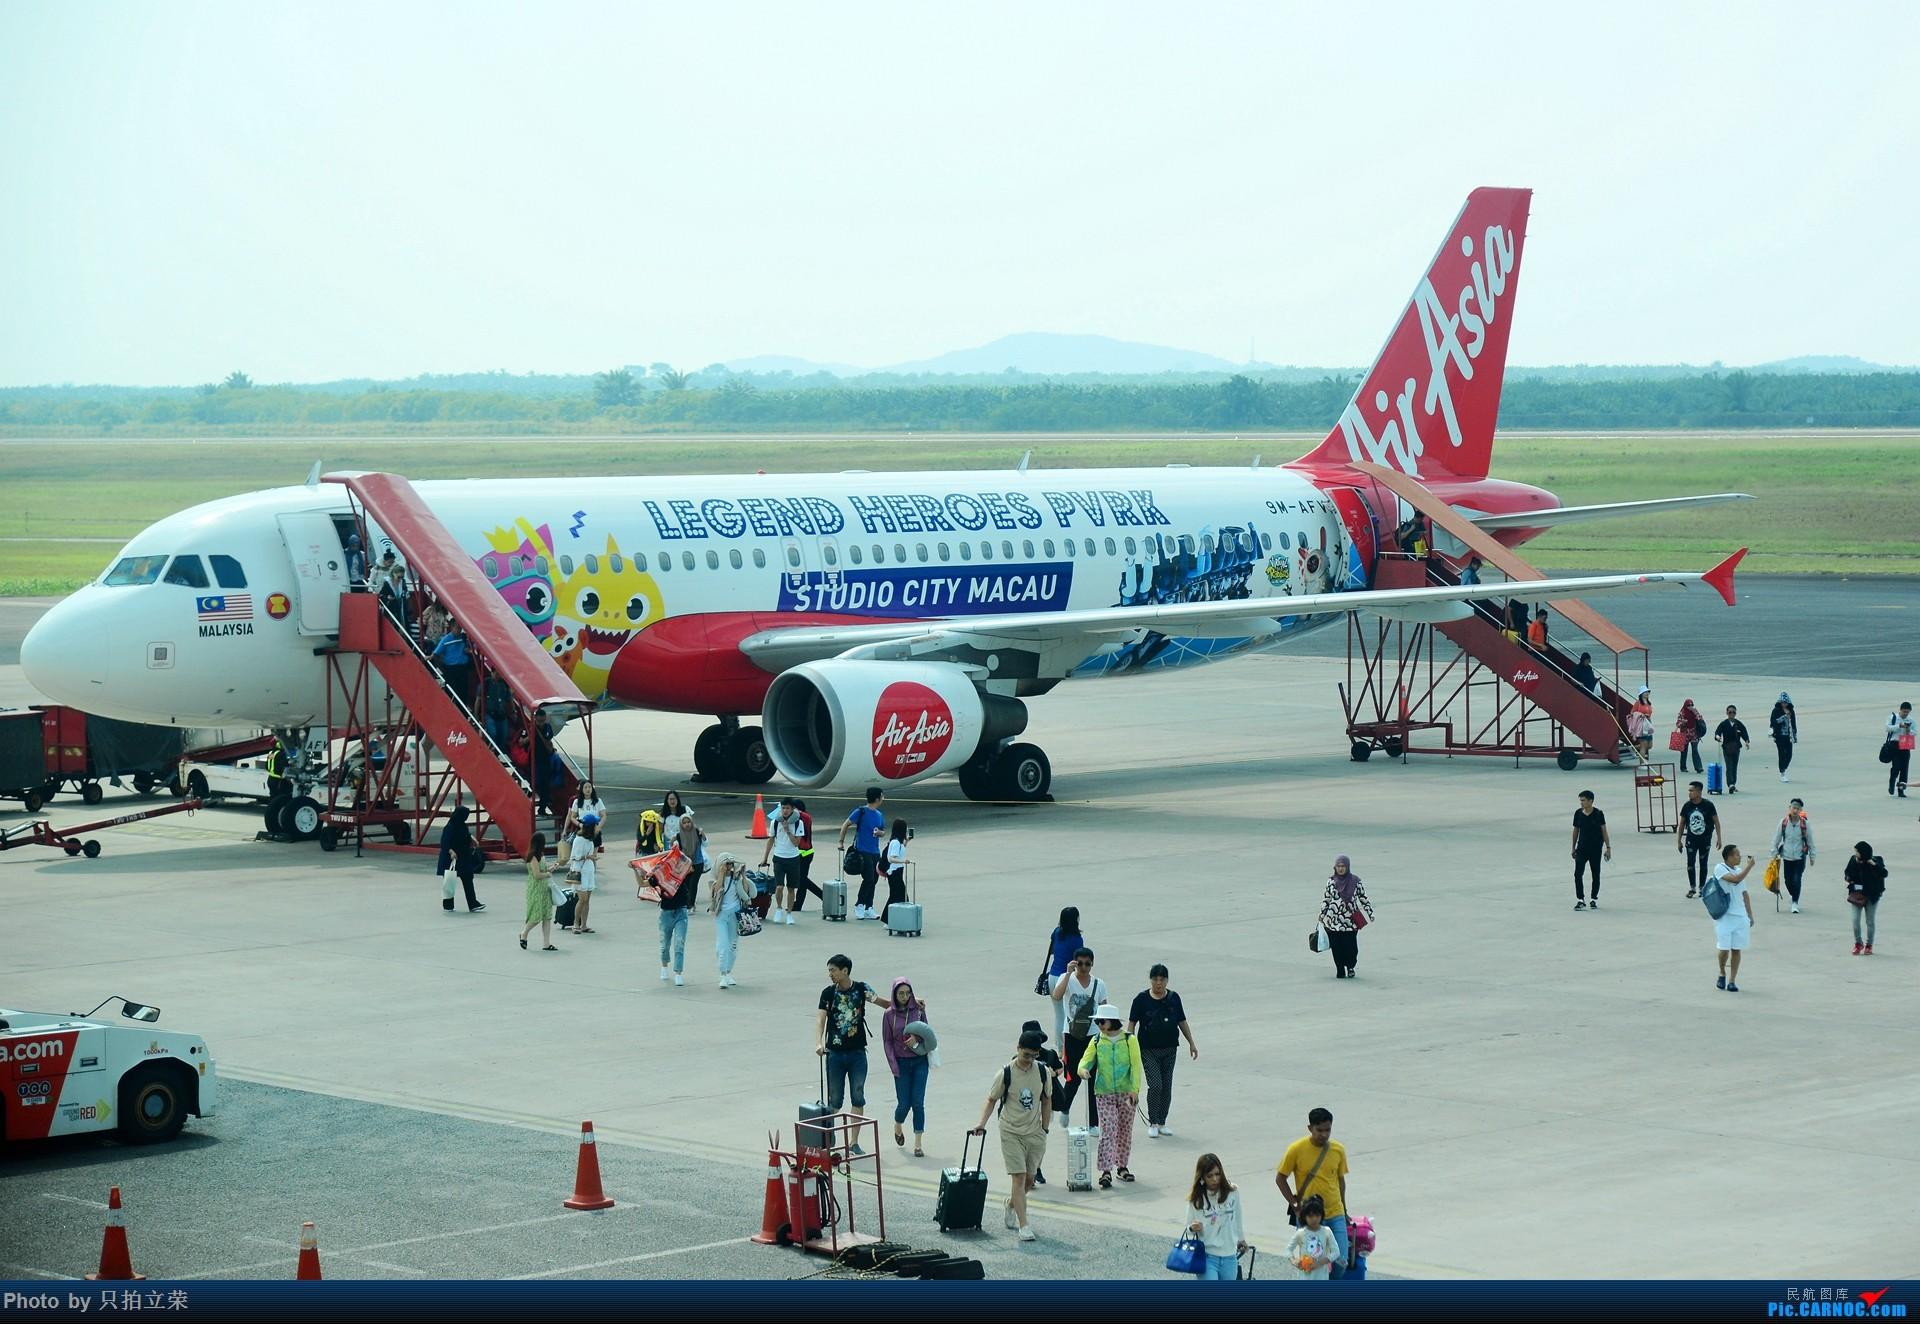 Re:[原创]湖南飞友会:只拍立荣回归。马来之旅航站楼杂图一堆。 AIRBUS A320  马来西亚斗湖机场